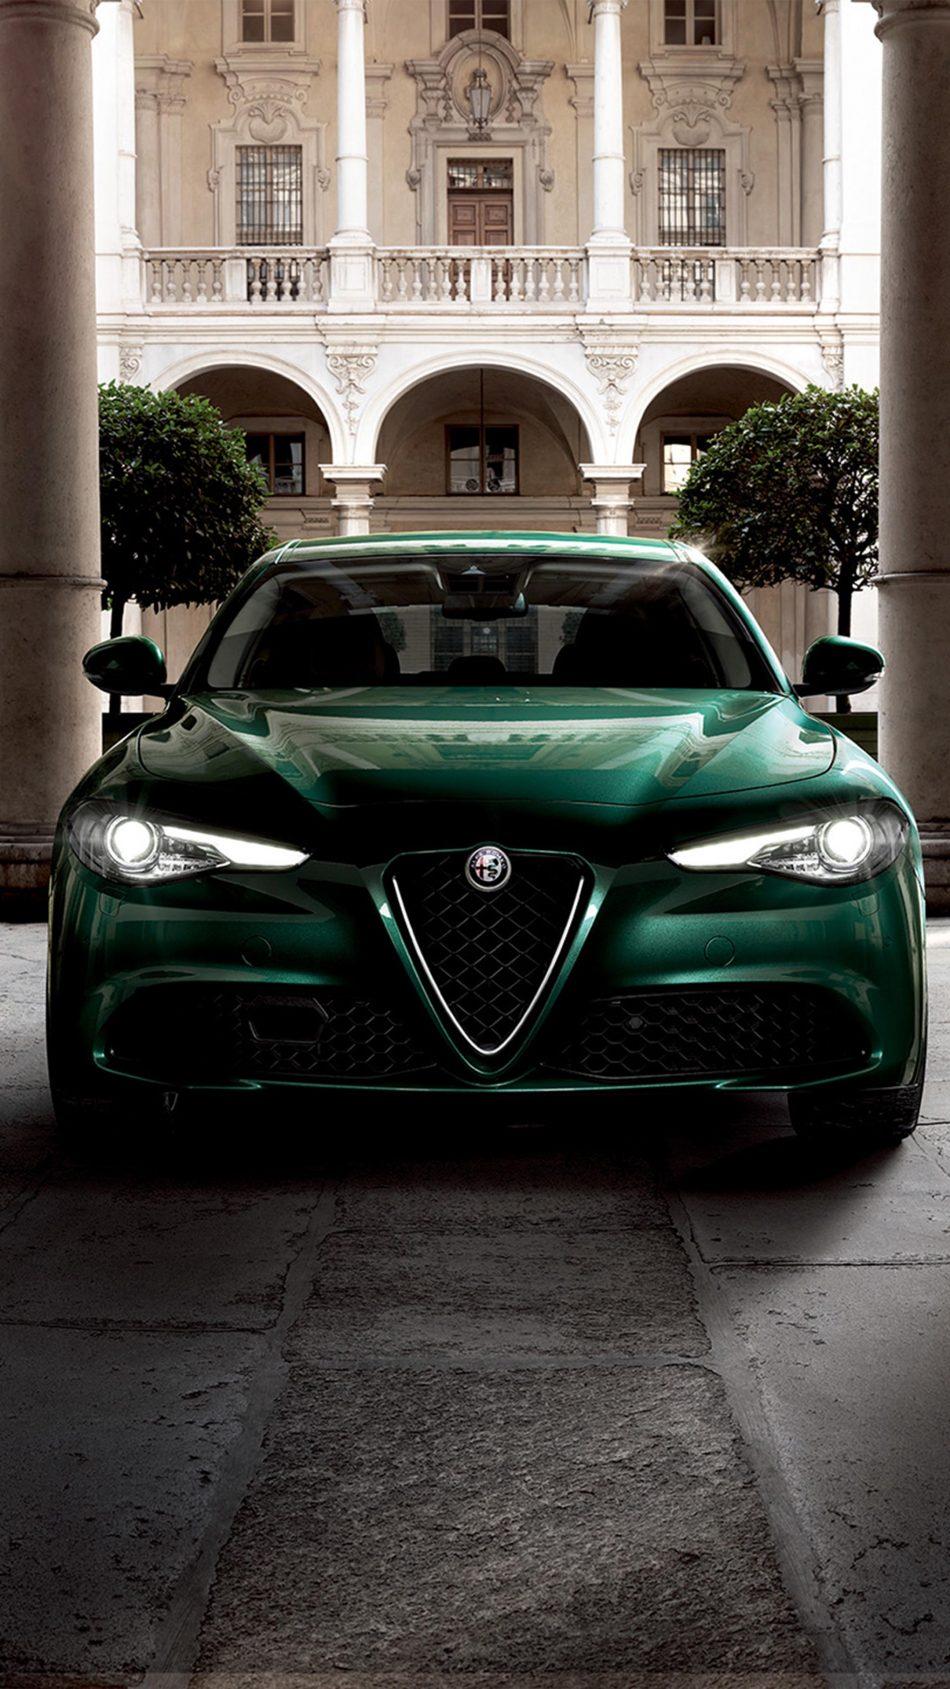 Alfa Romeo Giulia TI 2019 4K Ultra HD Mobile Wallpaper